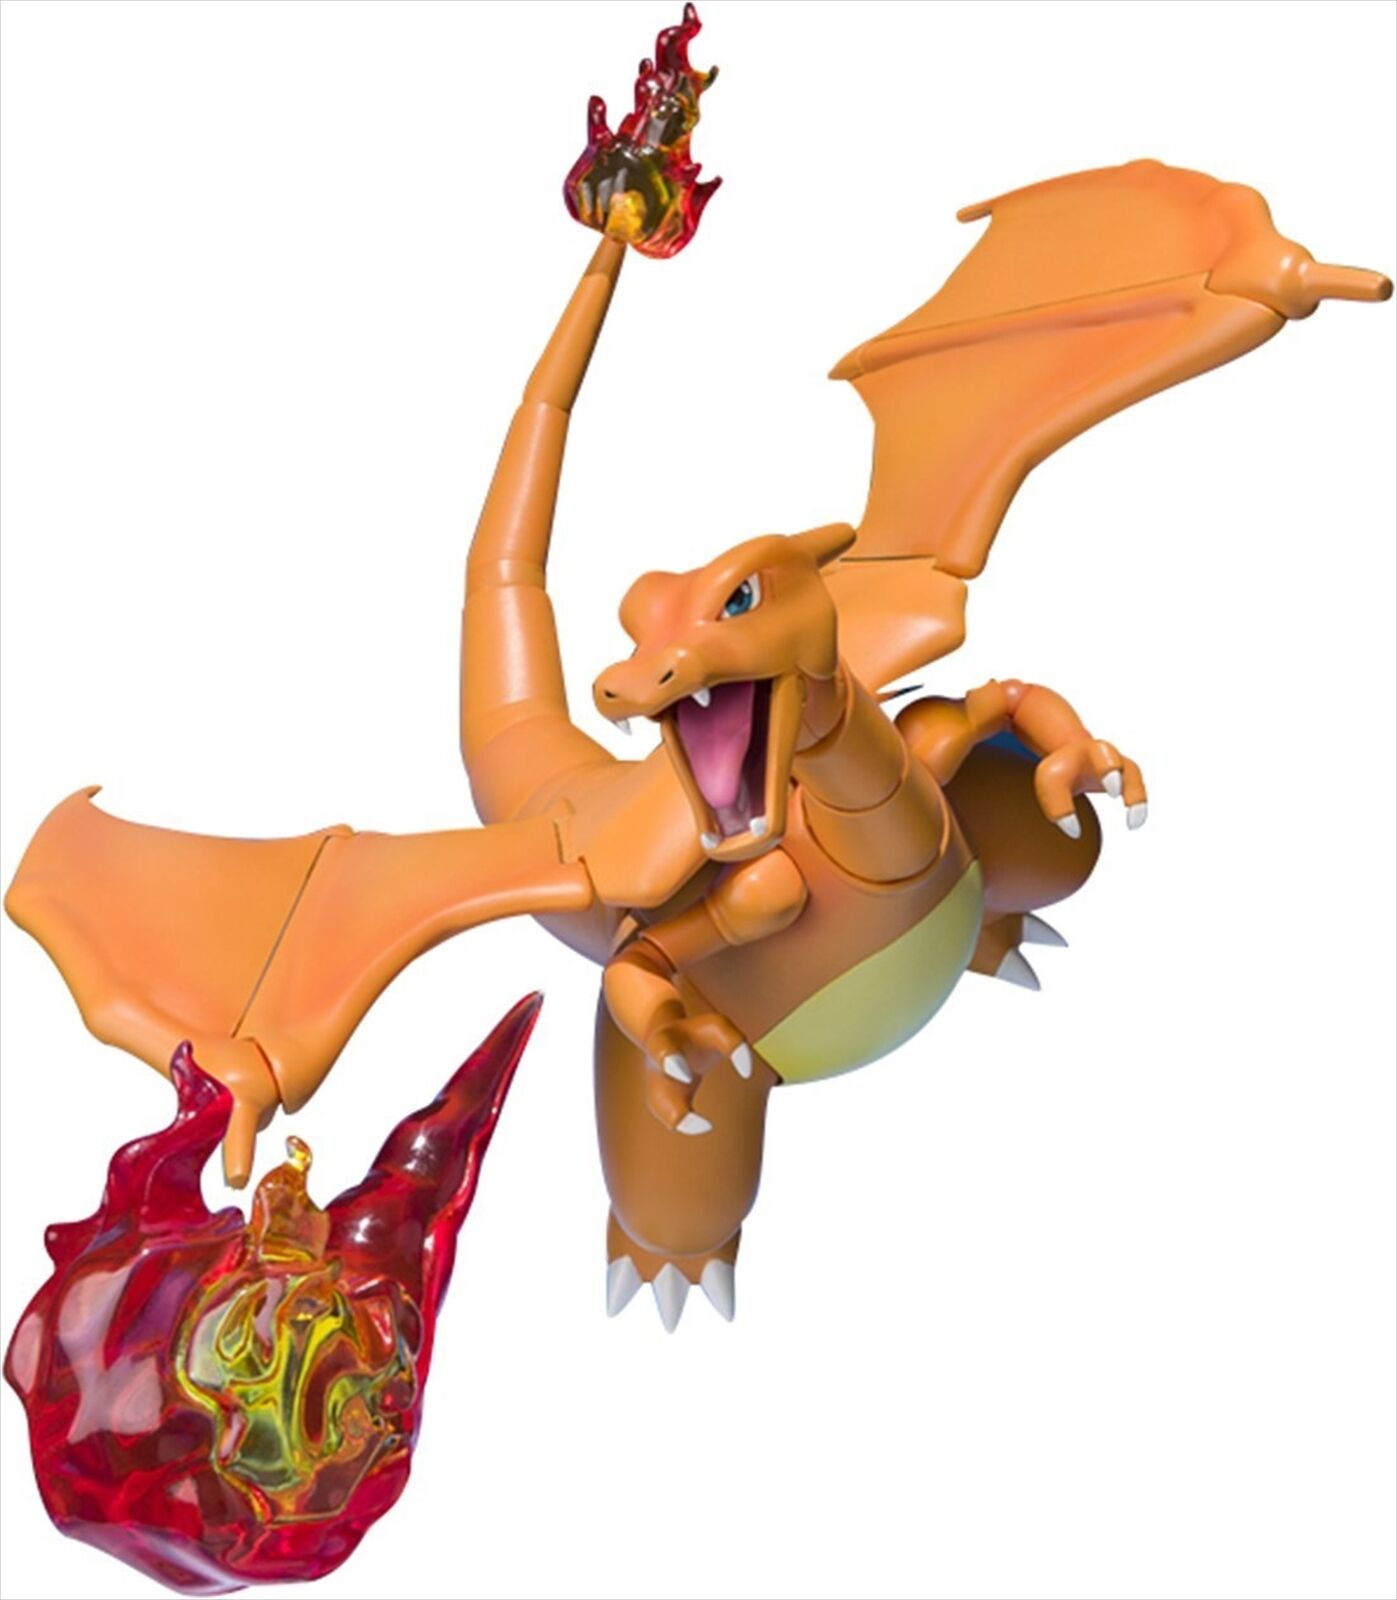 Bandai D-Arts Pokemon Charizard Lizardon Action Figure